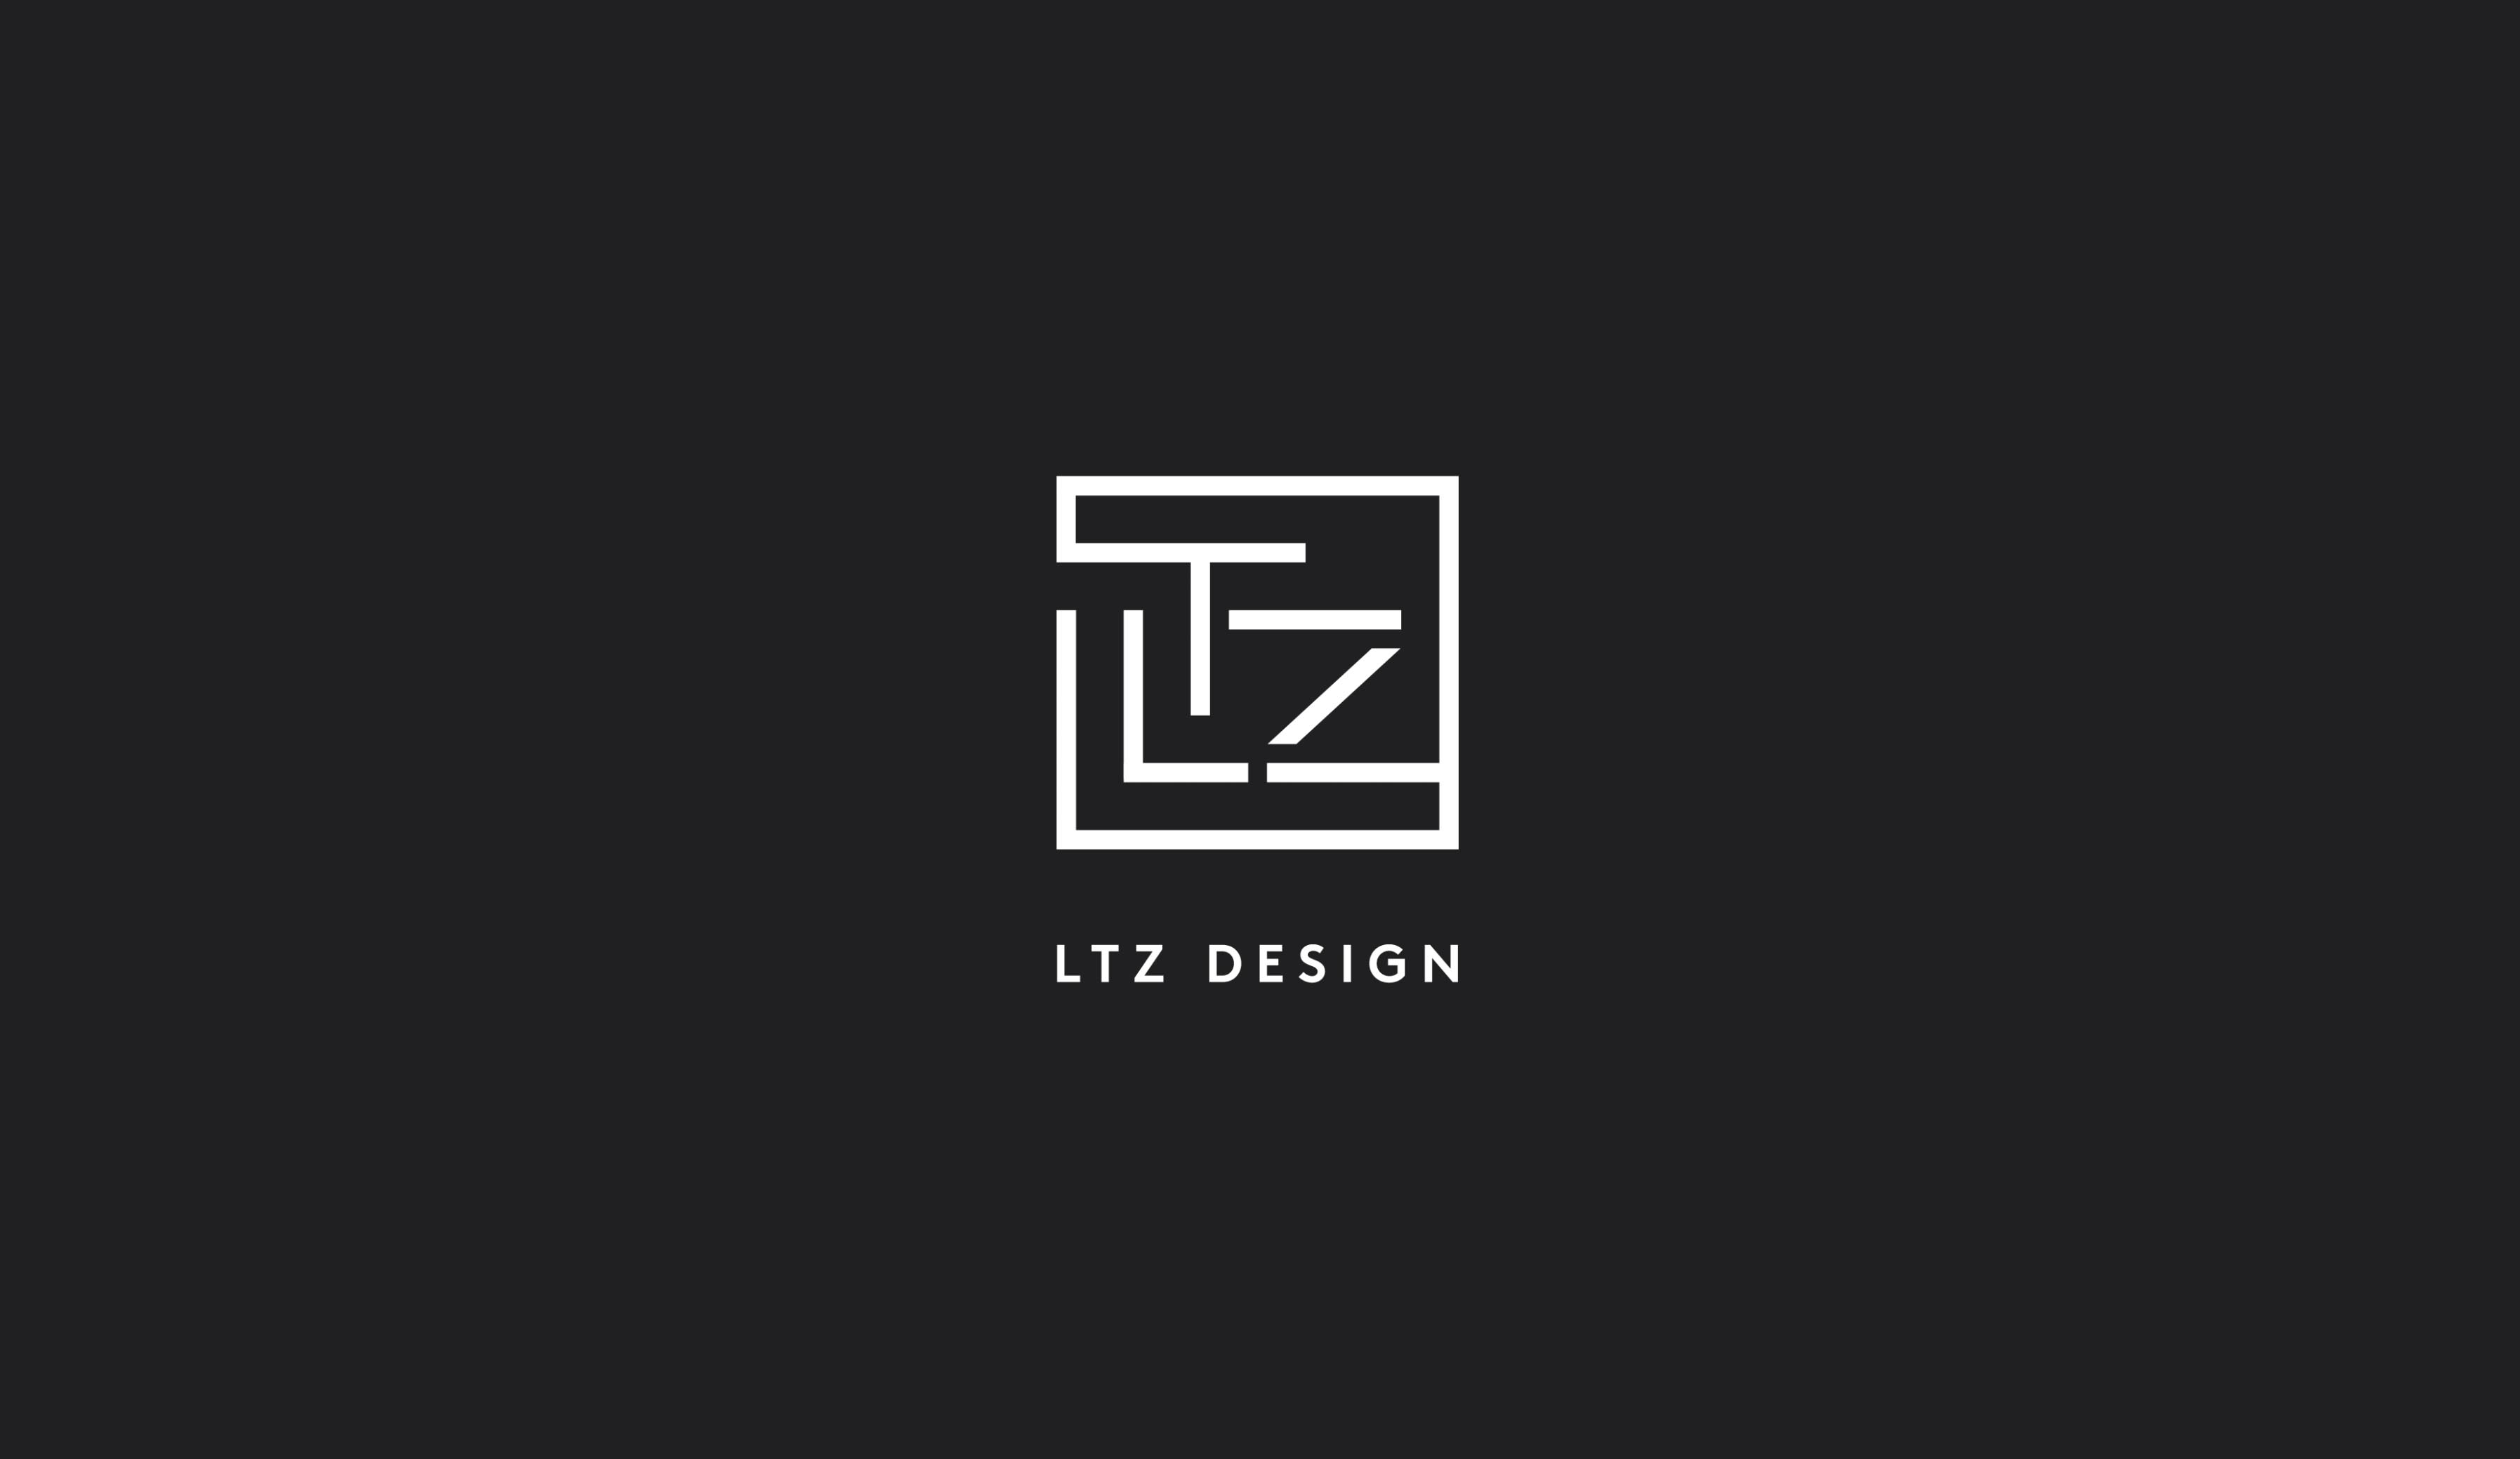 LTZ Design logo design